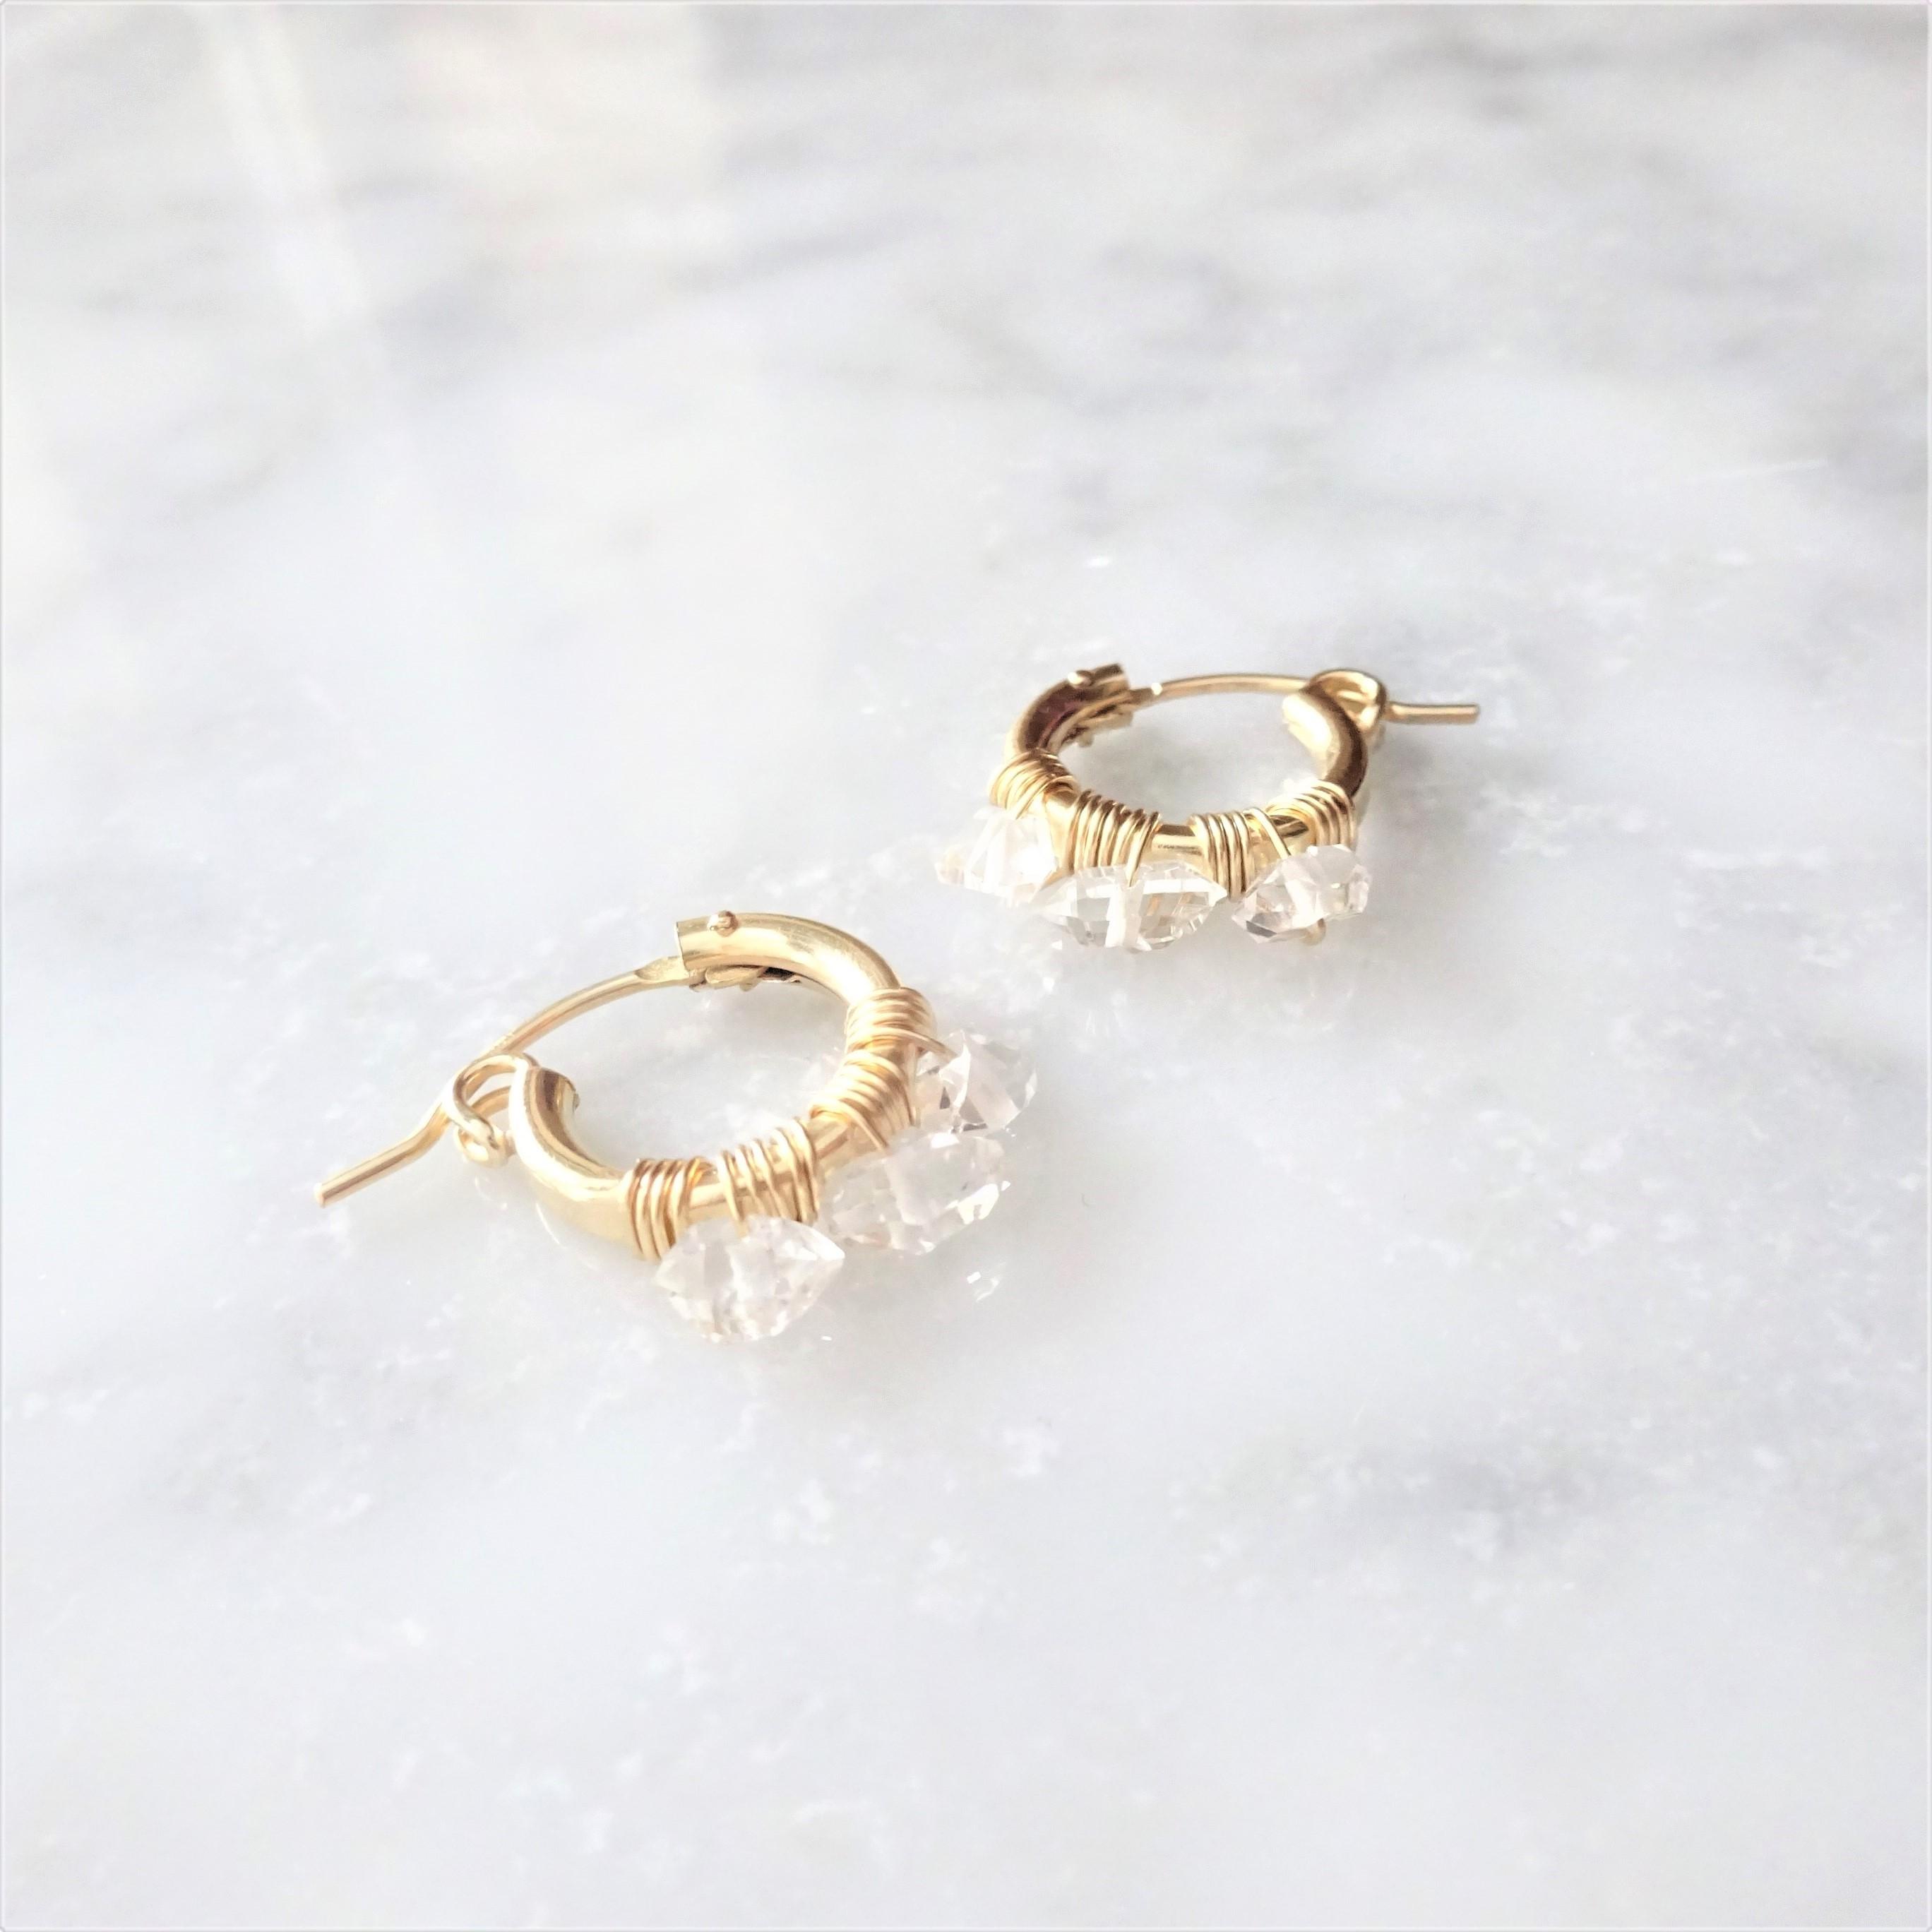 送料無料14kgf♡AAA 3 Herkimerdiamond hoop pierced earring/earring